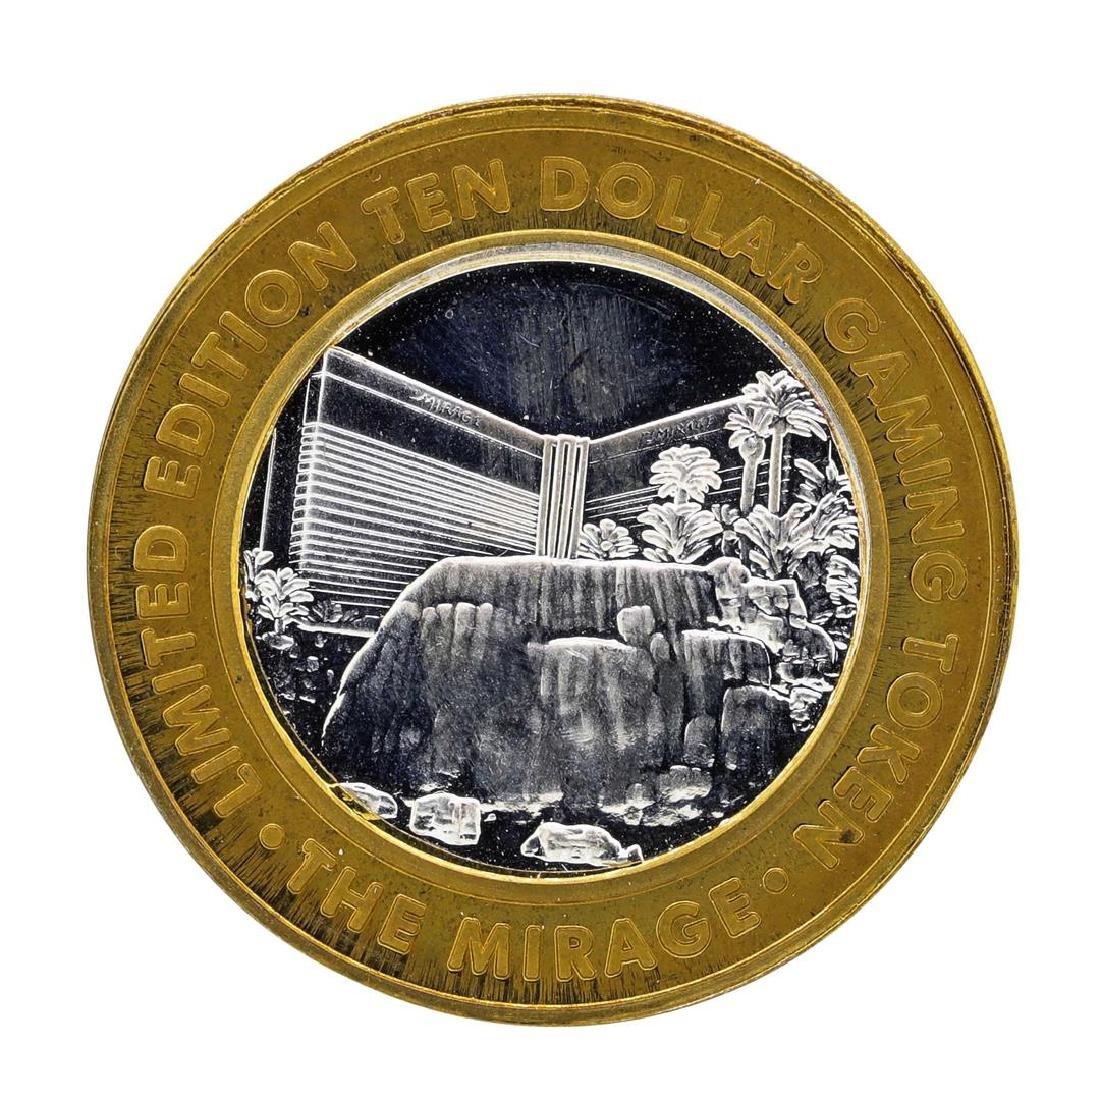 .999 Silver The Mirage Las Vegas, Nevada $10 Casino